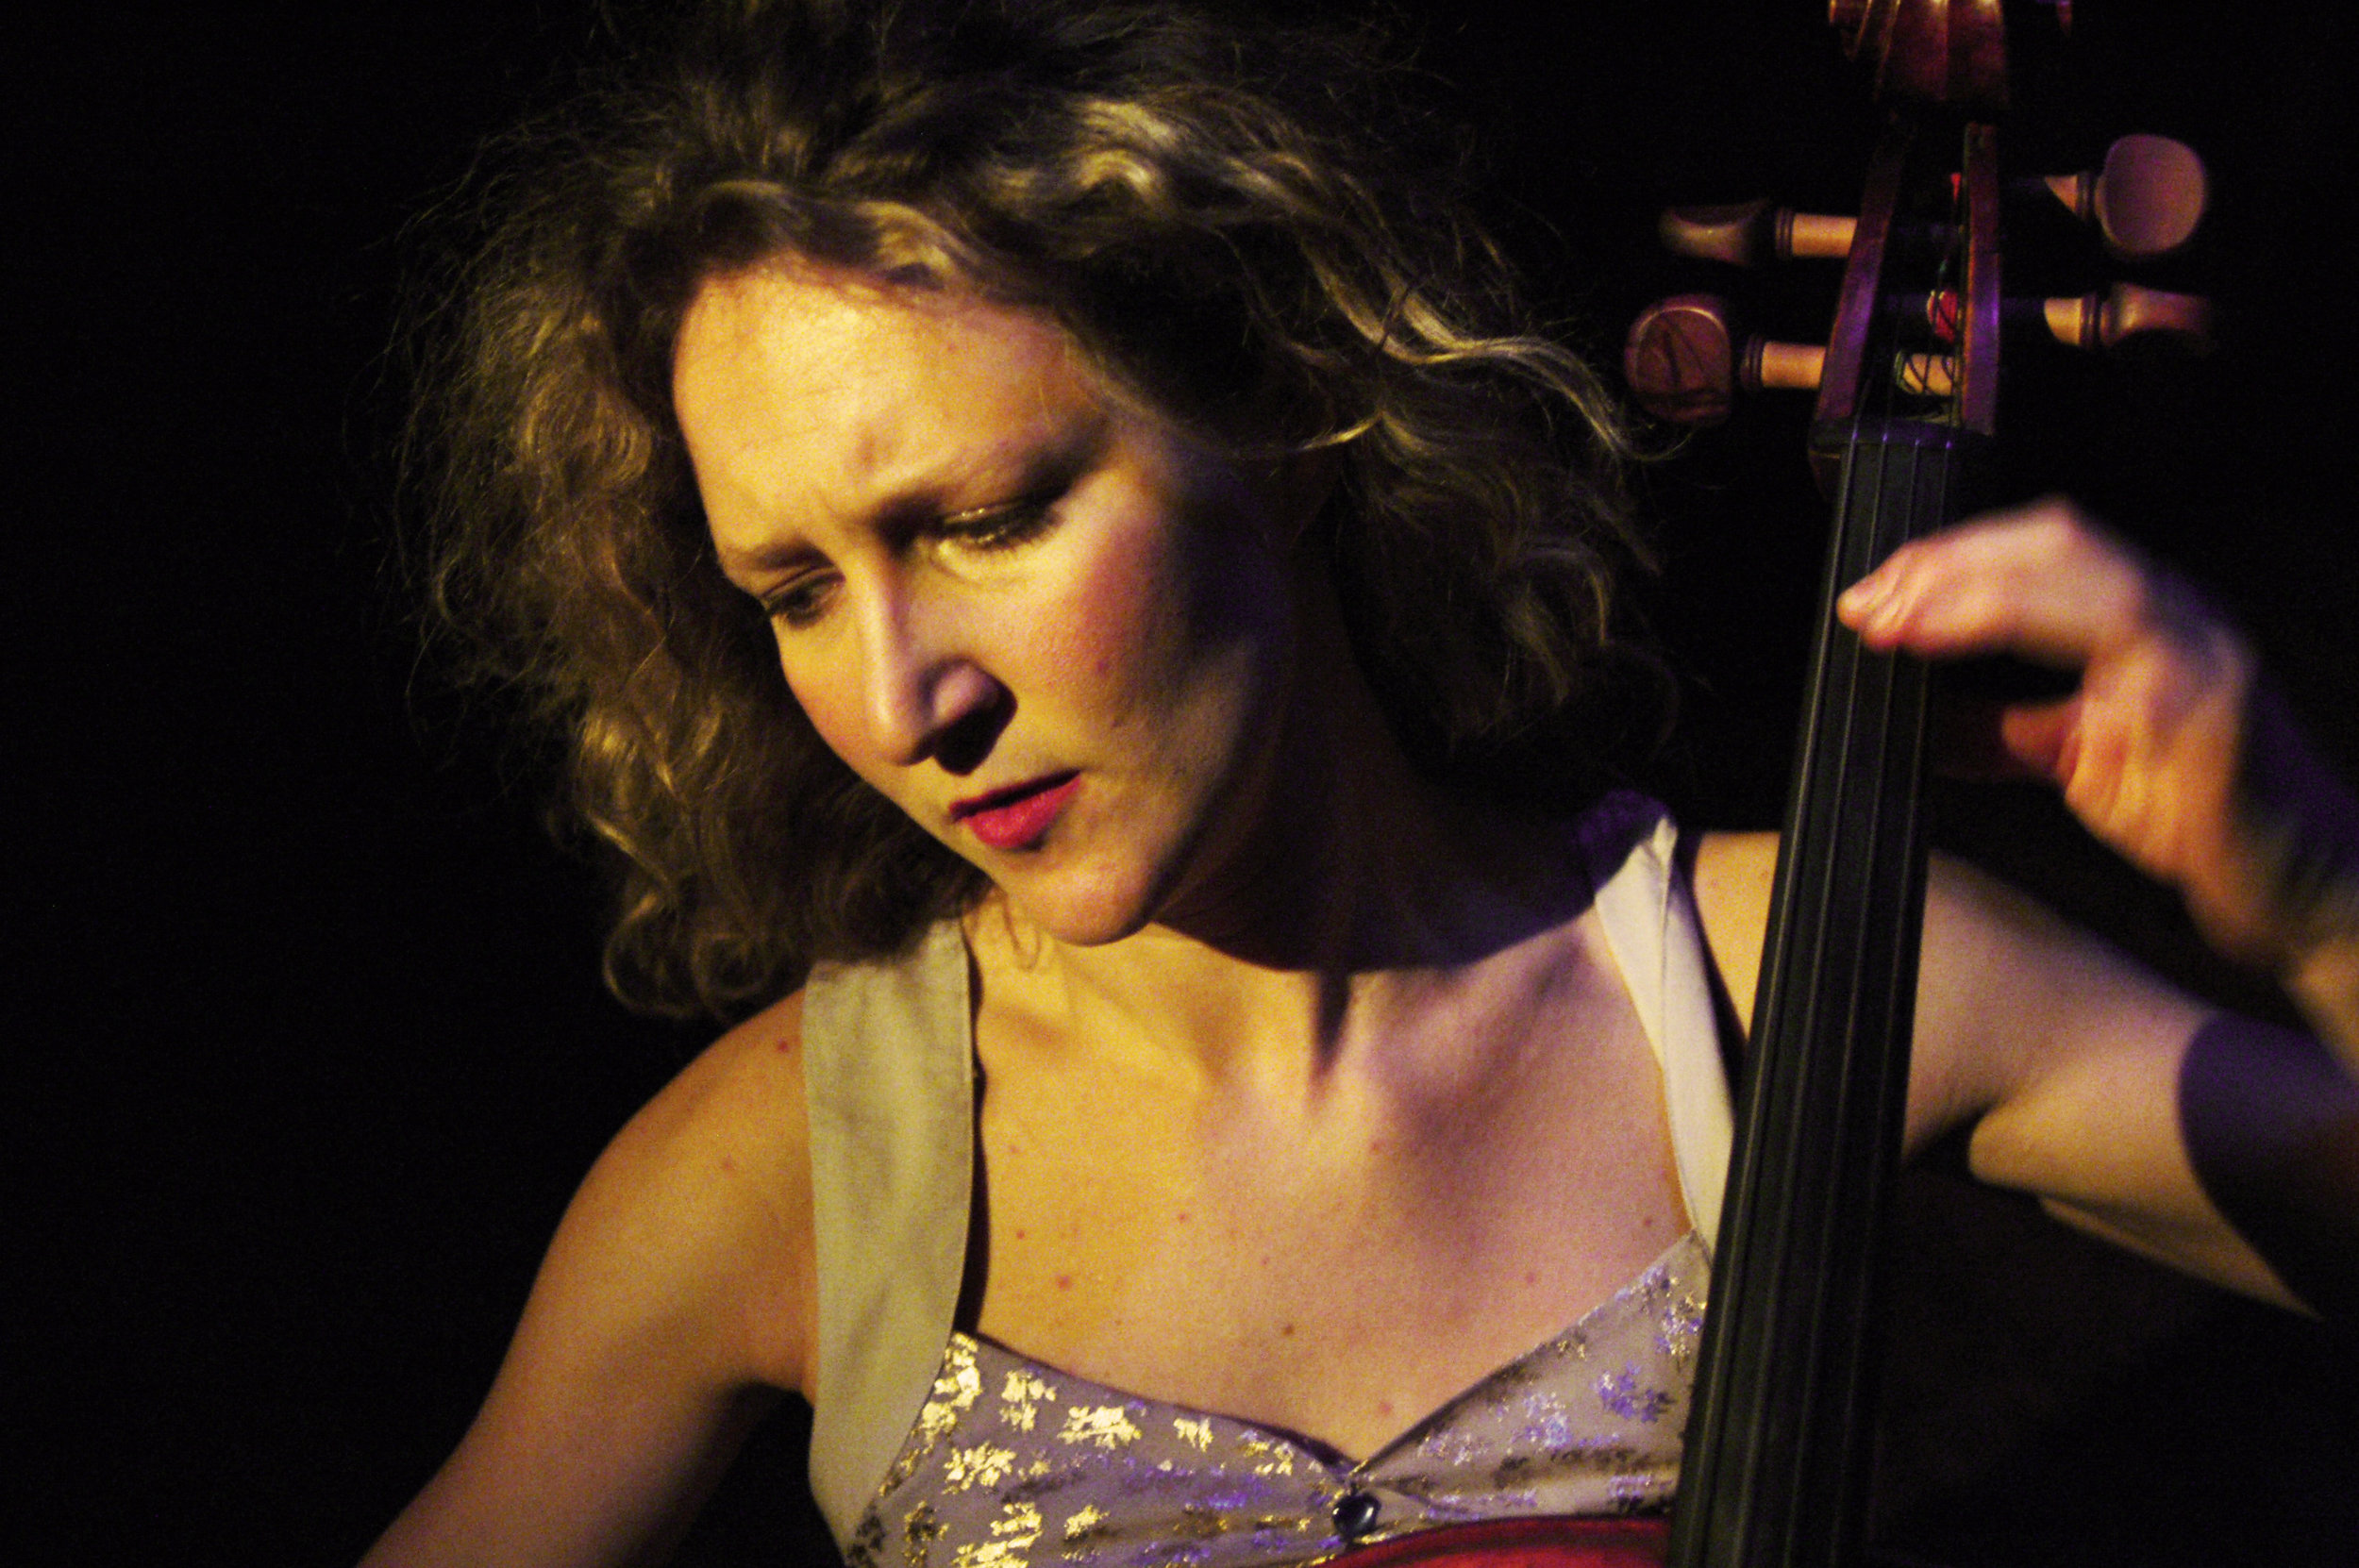 Titania Cello.jpg